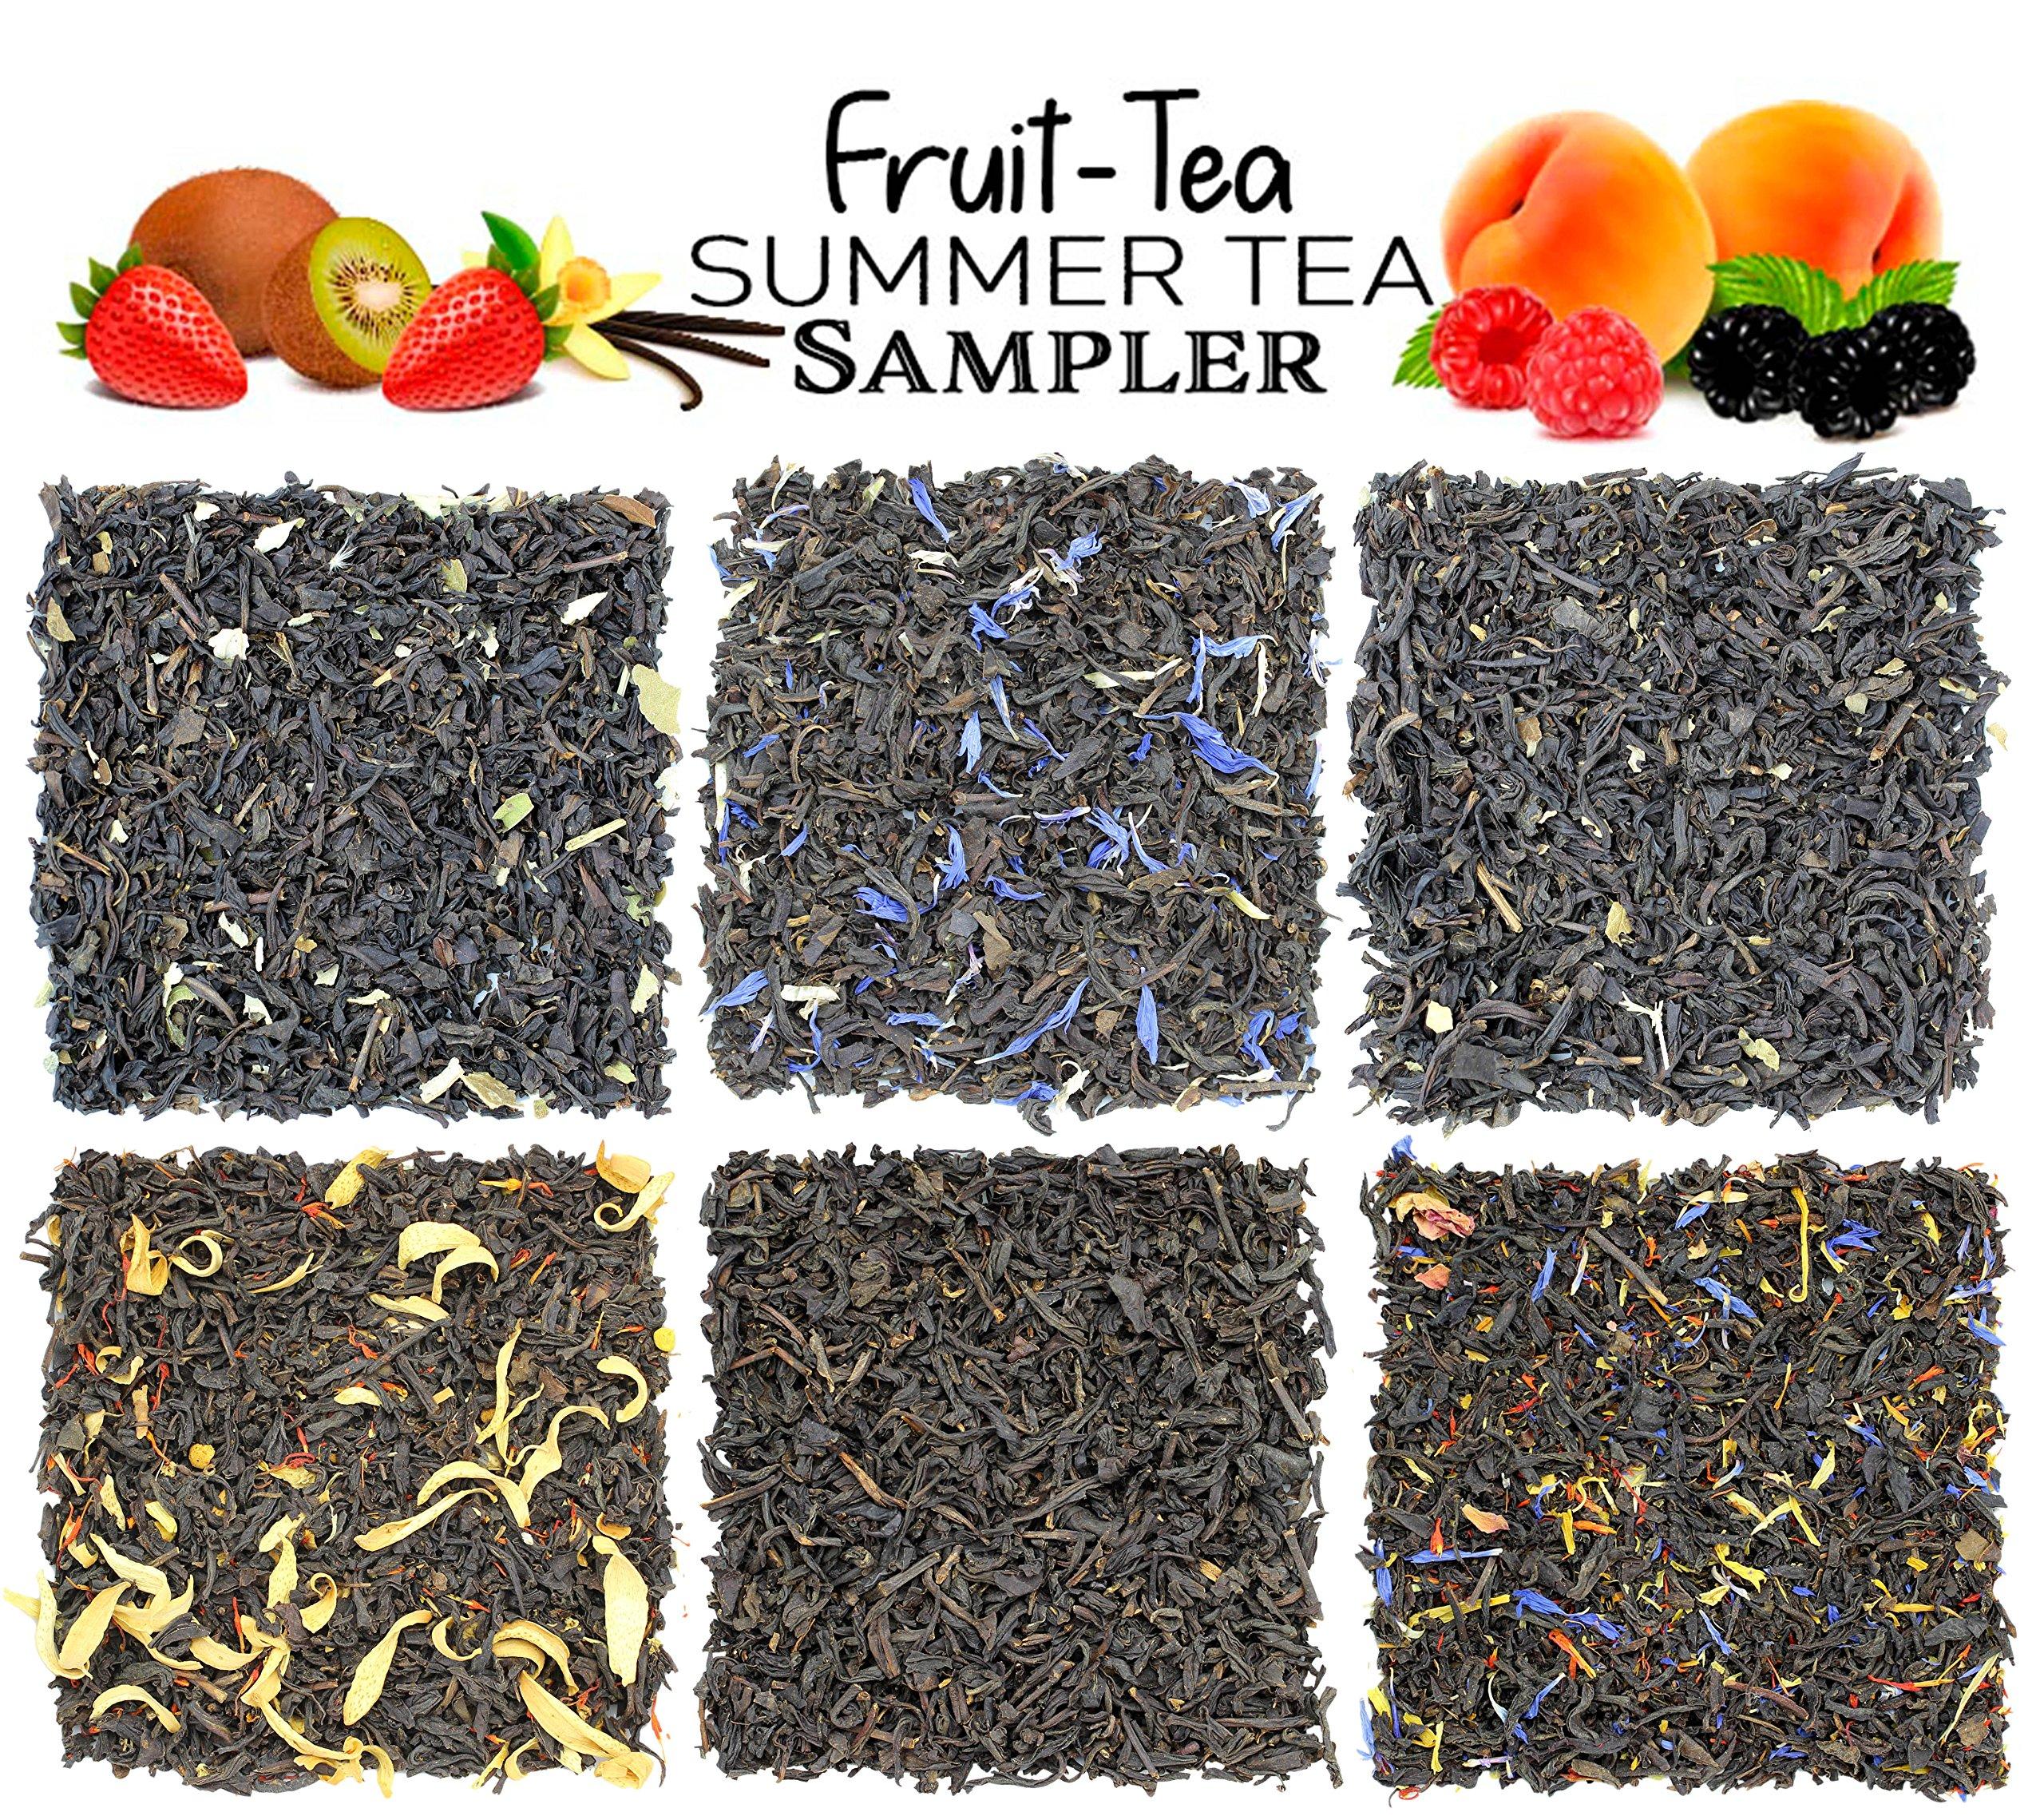 Fruit-Tea Summer Tea Sampler, Refreshing Loose Leaf Tea Assortment Featuring Blackberry, Vanilla, Tropicana, Gold Rush, Raspberry, Strawberry Kiwi Black Teas - Approx 90+Cups